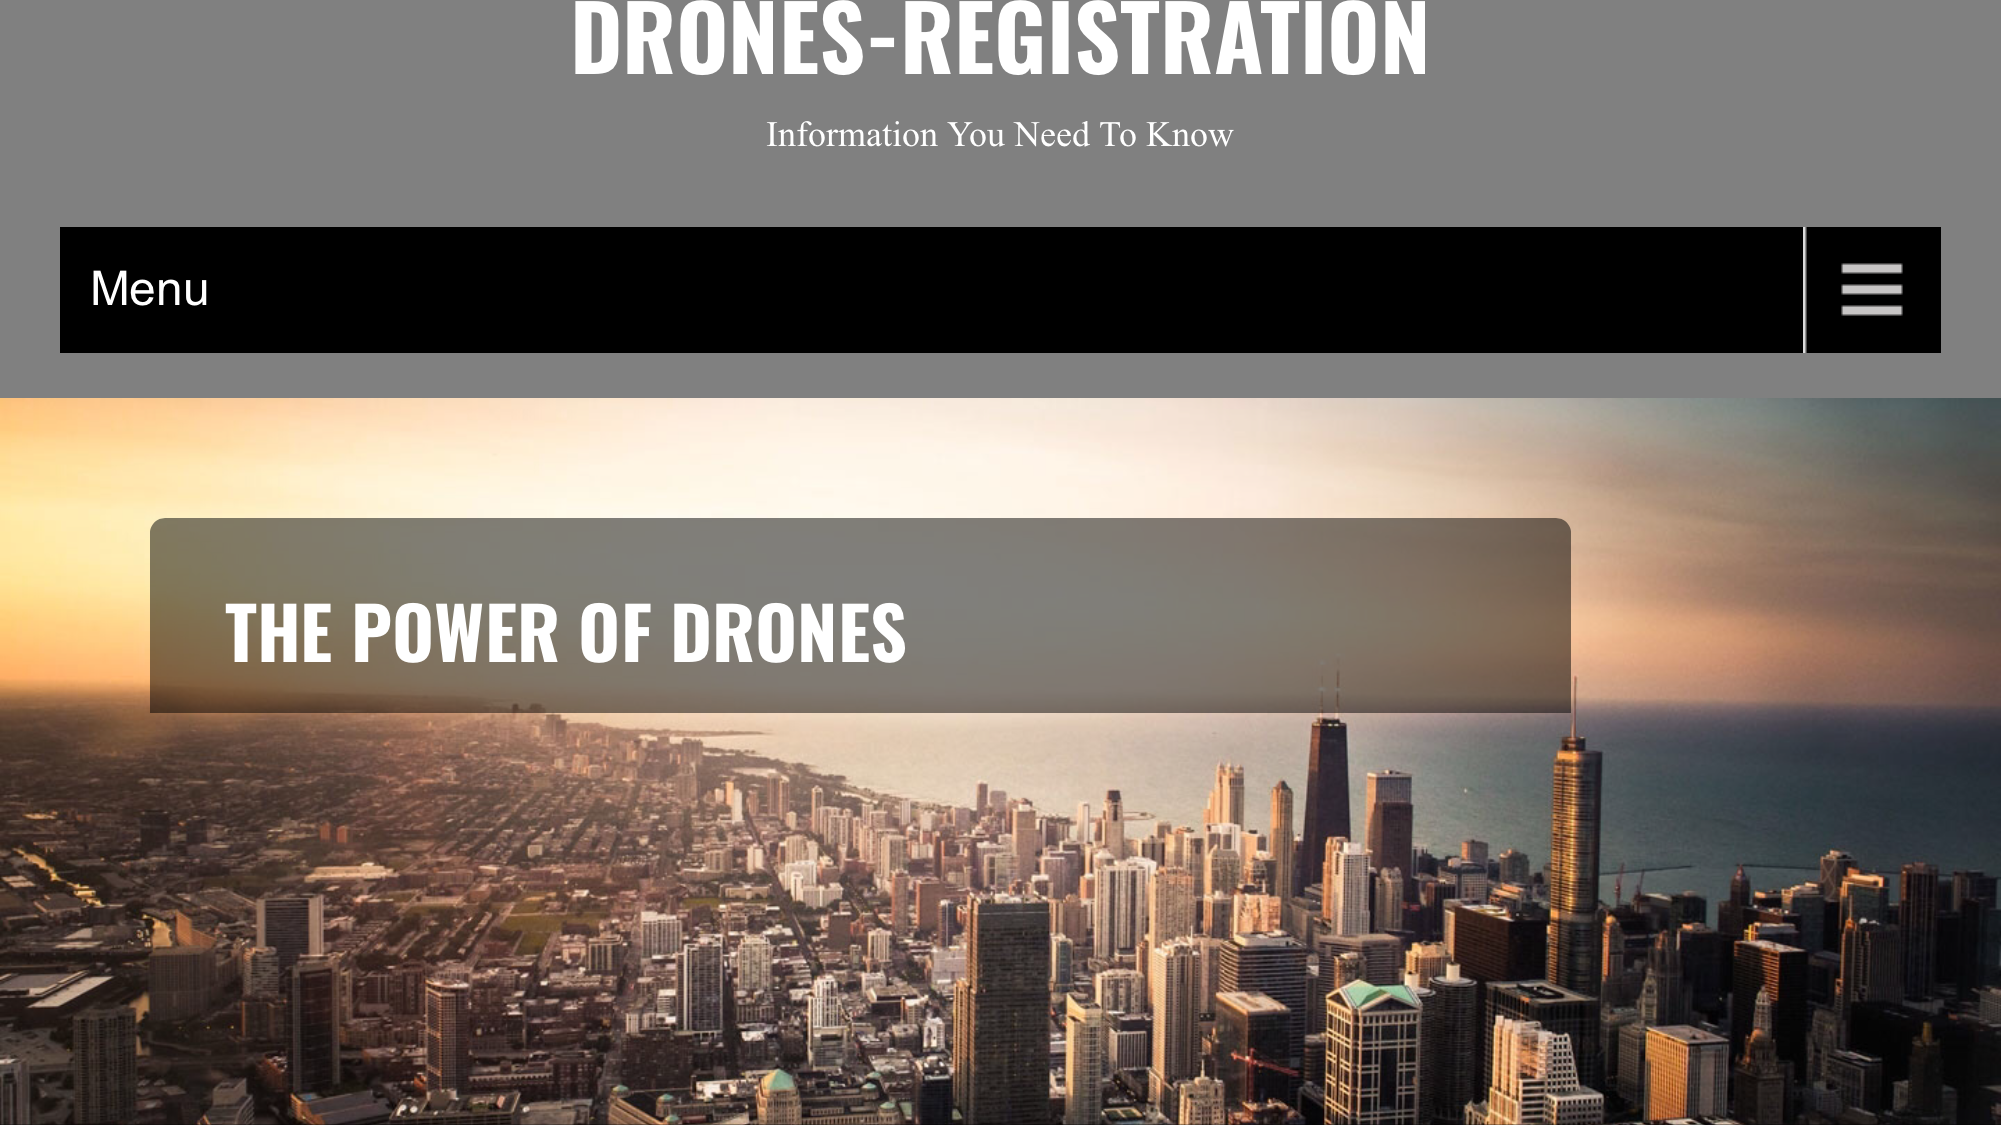 DronesRegistration.com